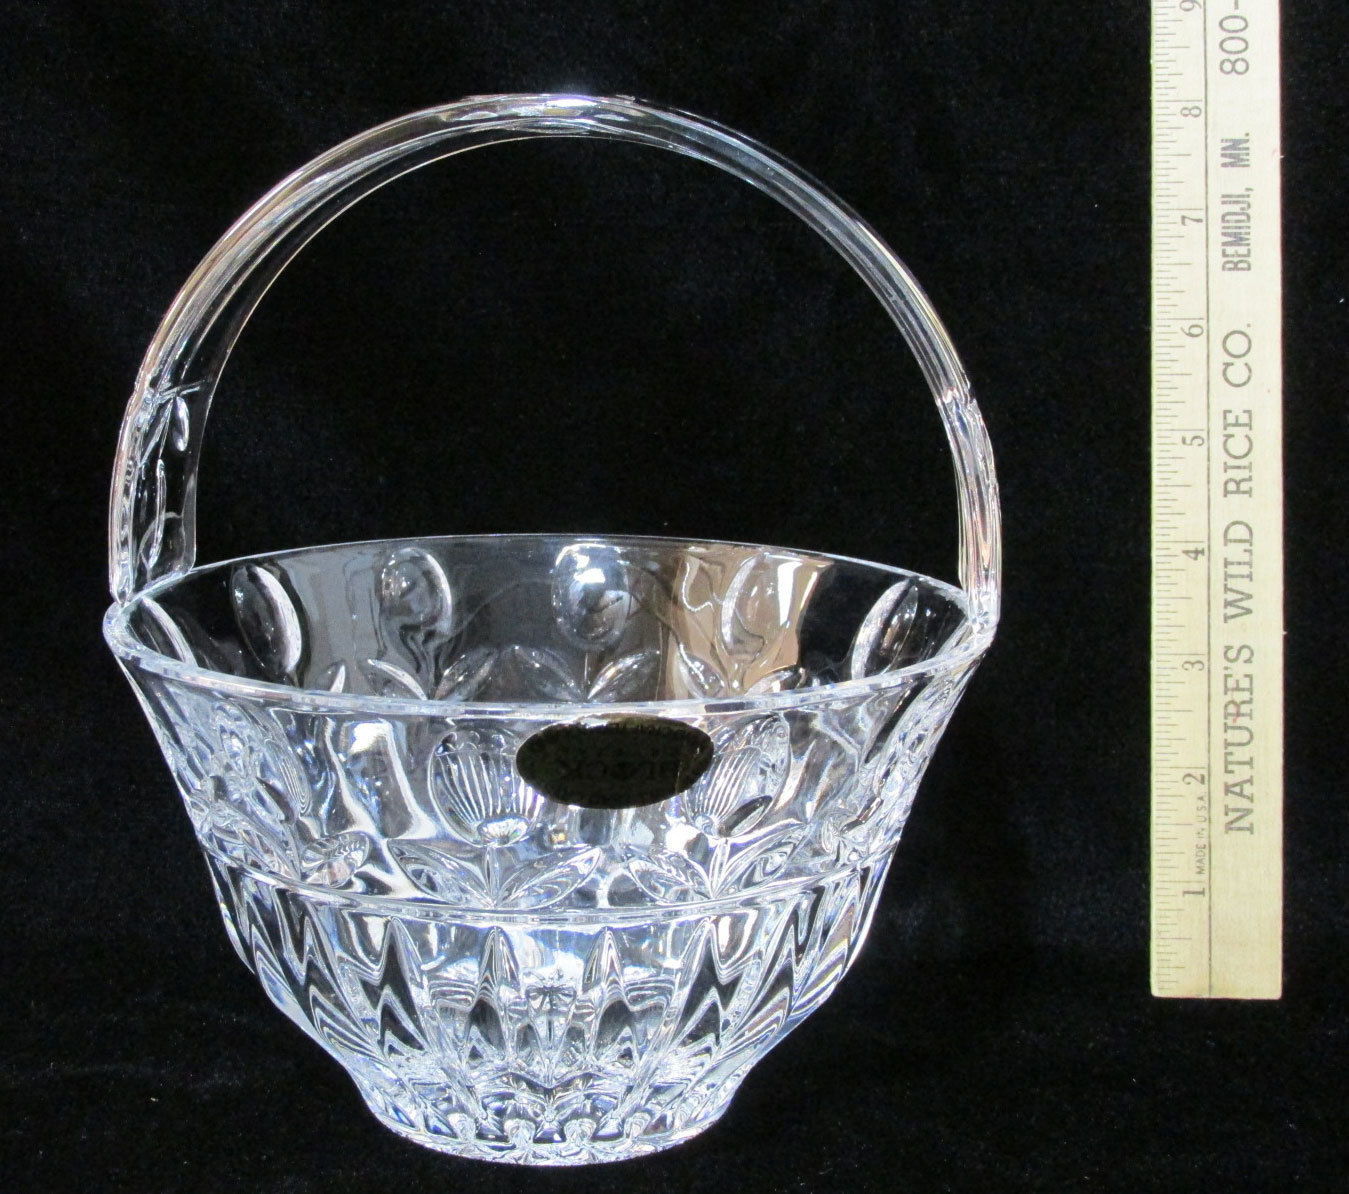 coloured glass vases ebay of block crystal tulip garden handled basket y3916 ebay for norton secured powered by verisign